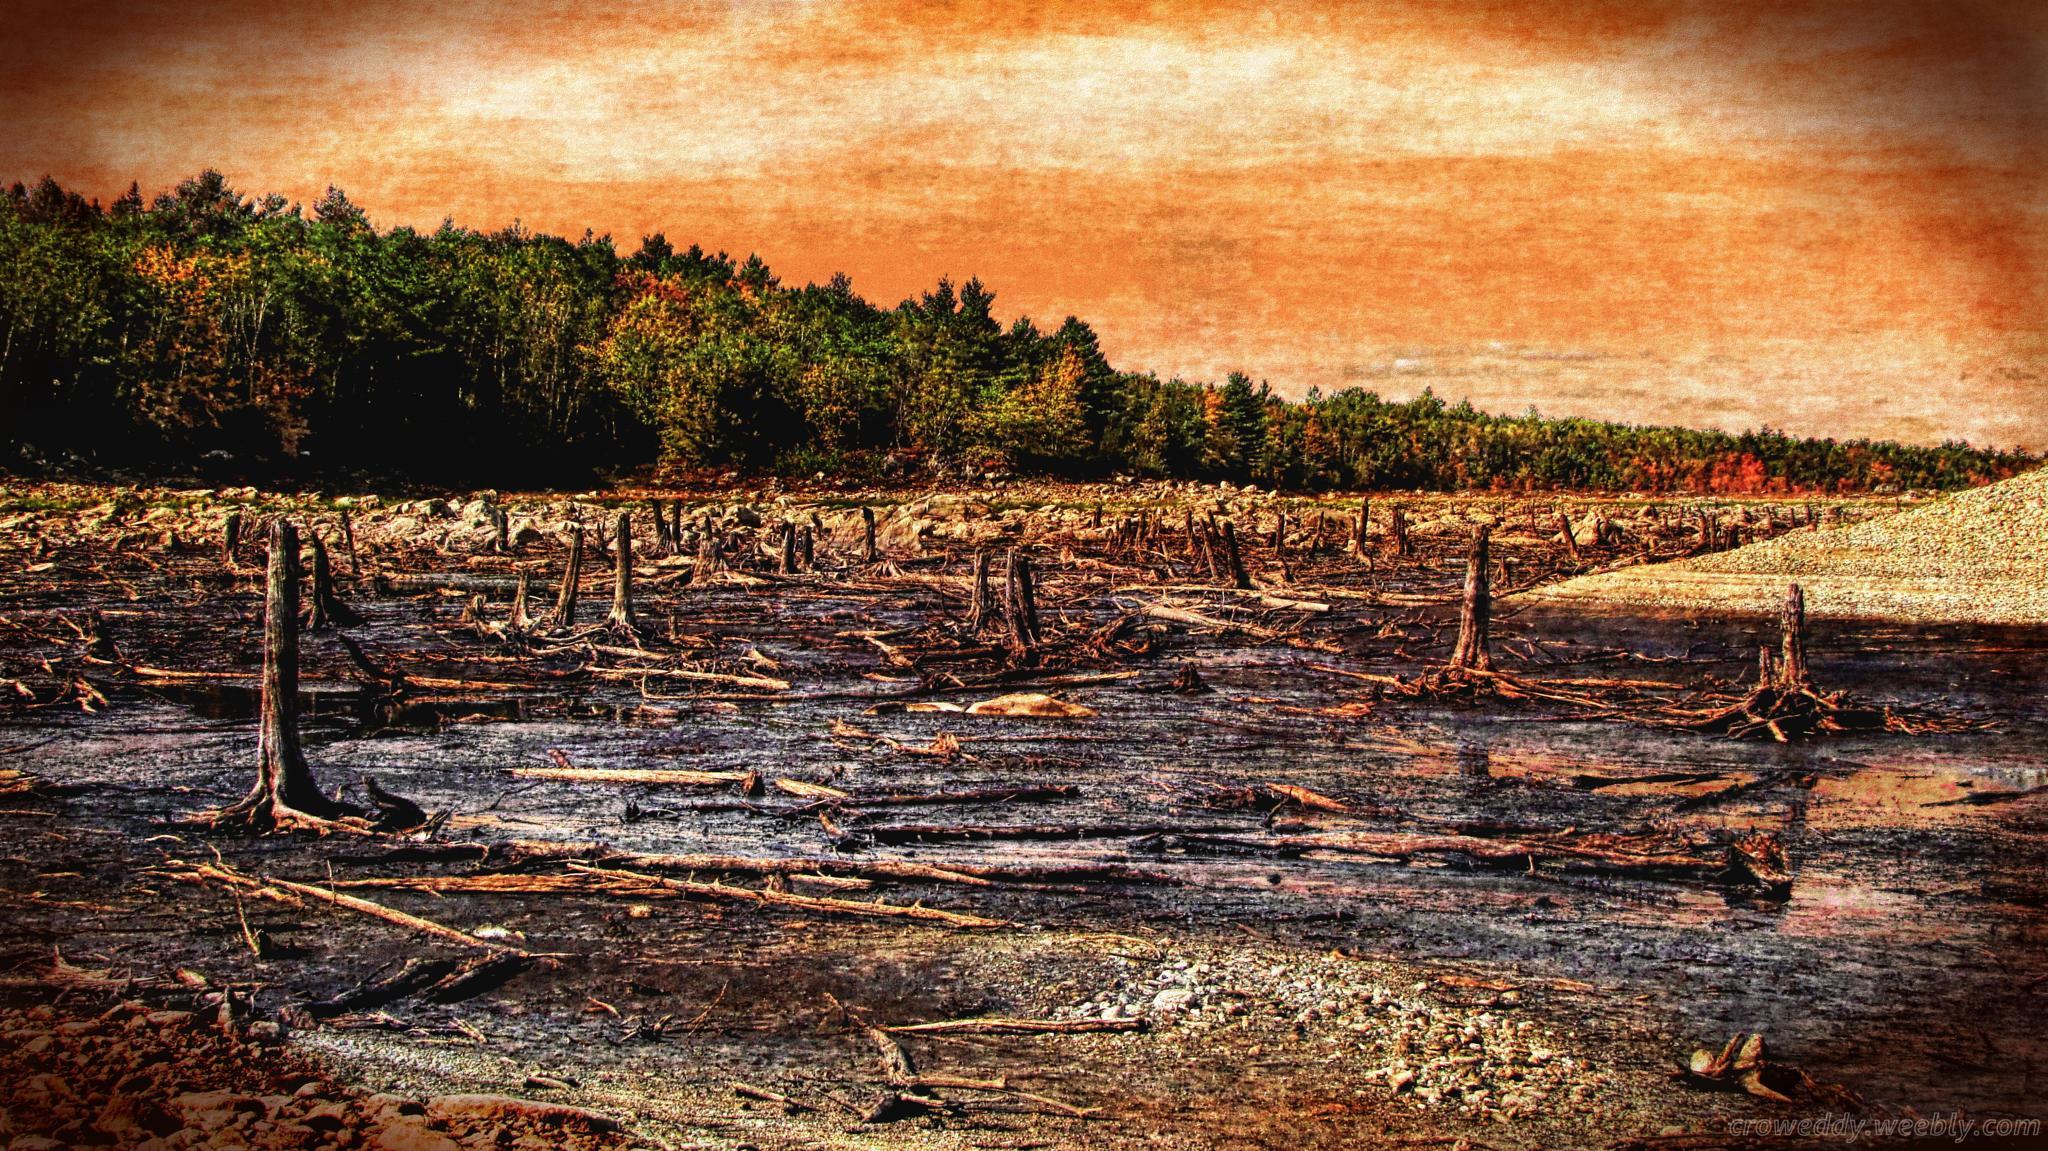 stumps by crow eddy